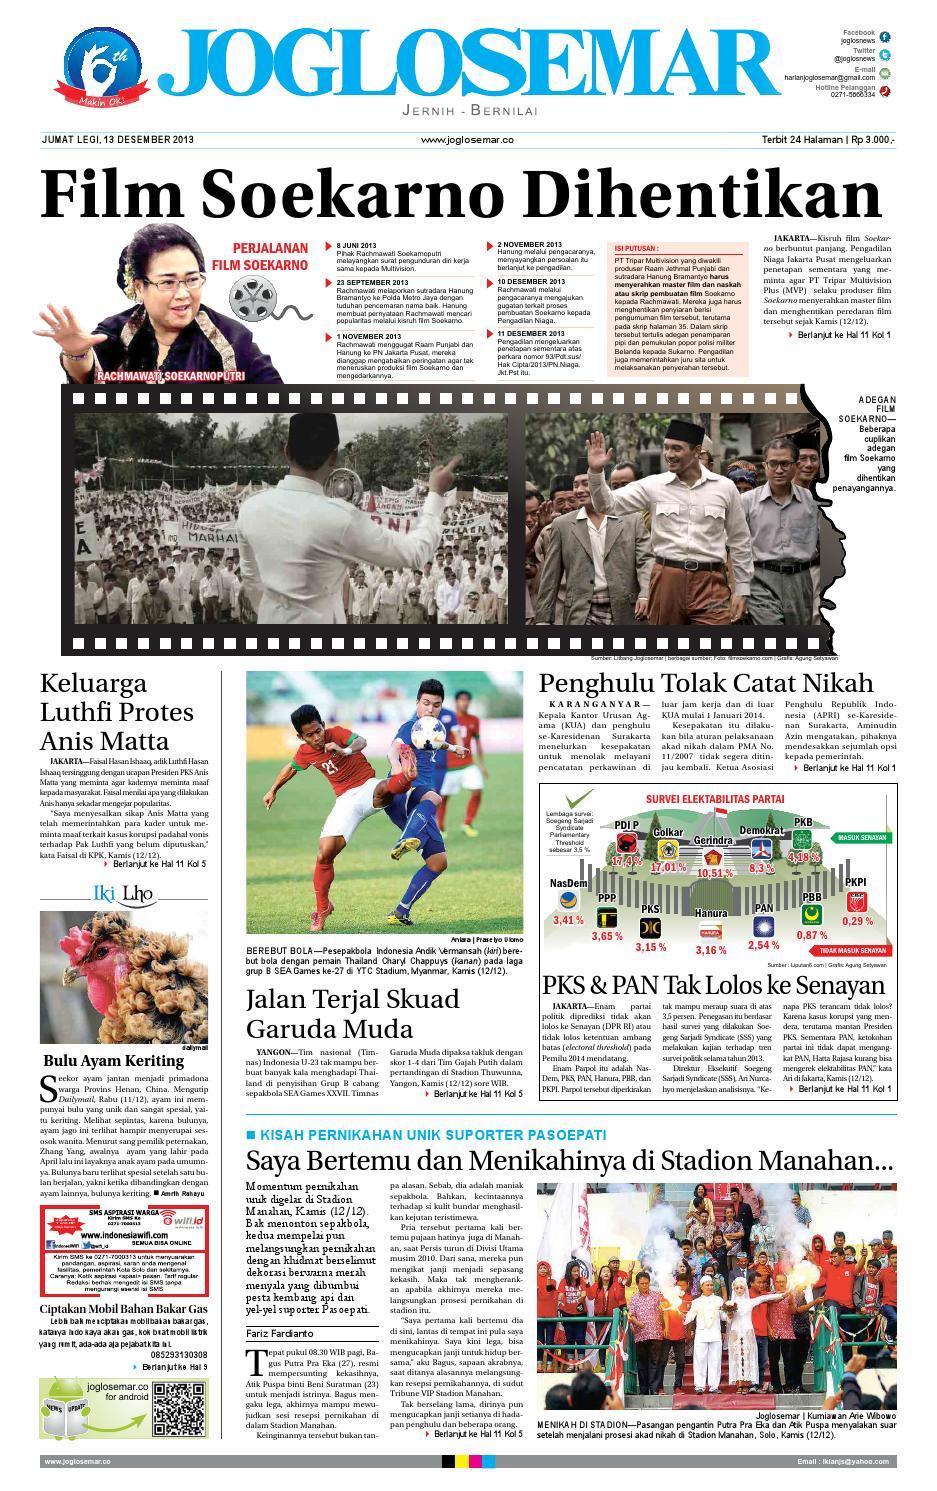 Epaper Edisi 13 Desember 2013 By Pt Joglosemar Prima Media Issuu Kue Bakpia Kuliner Yulis Saekowati Akumandiri